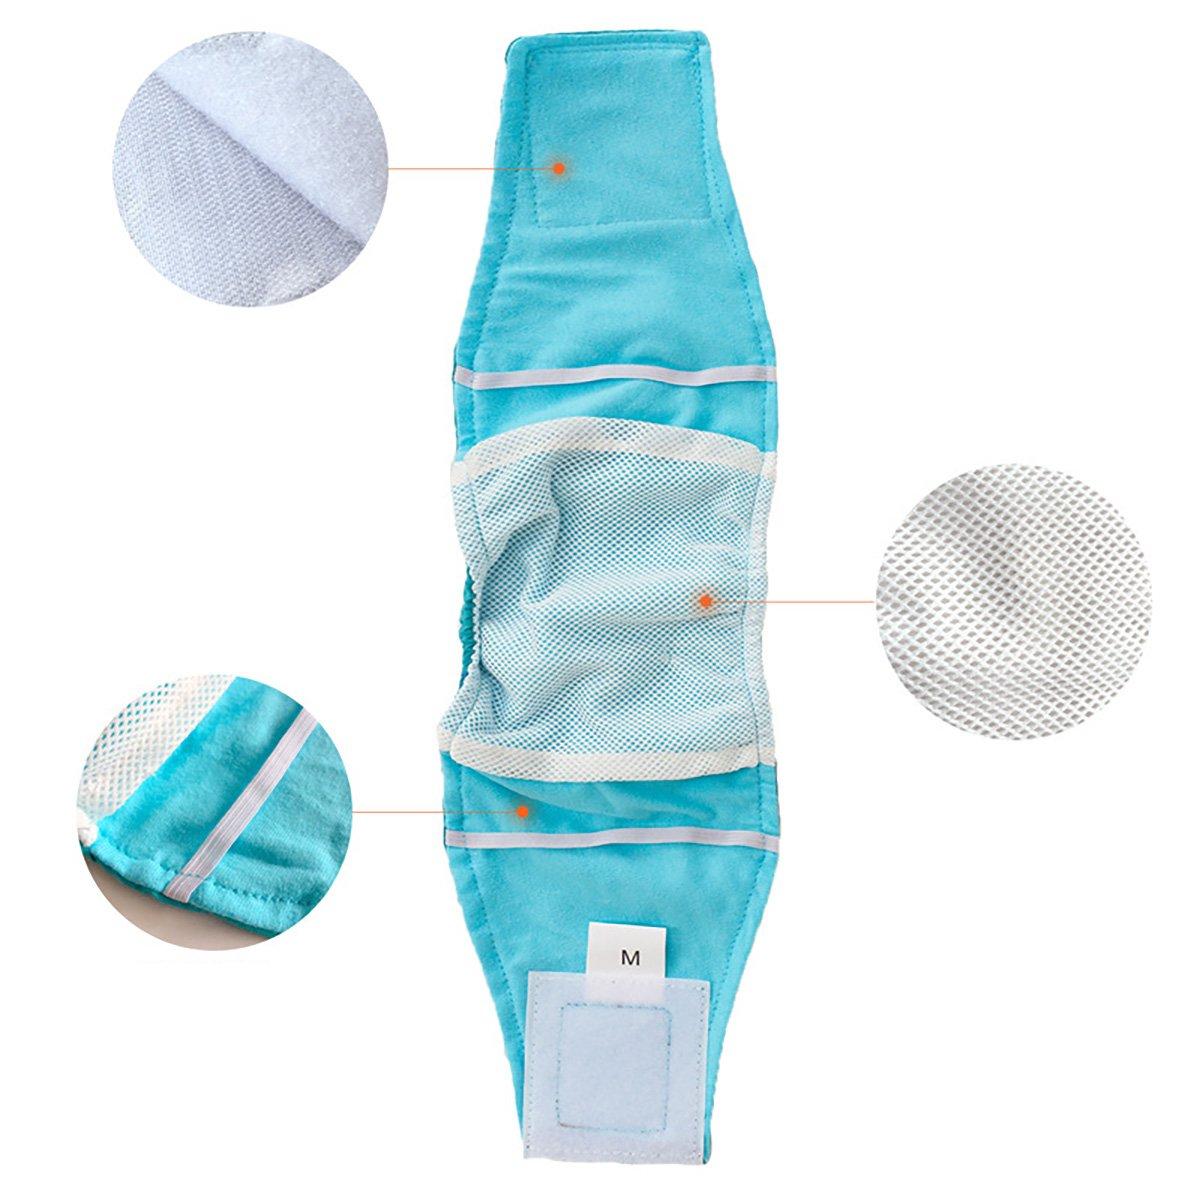 UHeng 4 PCS Male Dog Reusable Wrap Diaper Washable Puppy Belly Band by UHeng (Image #7)